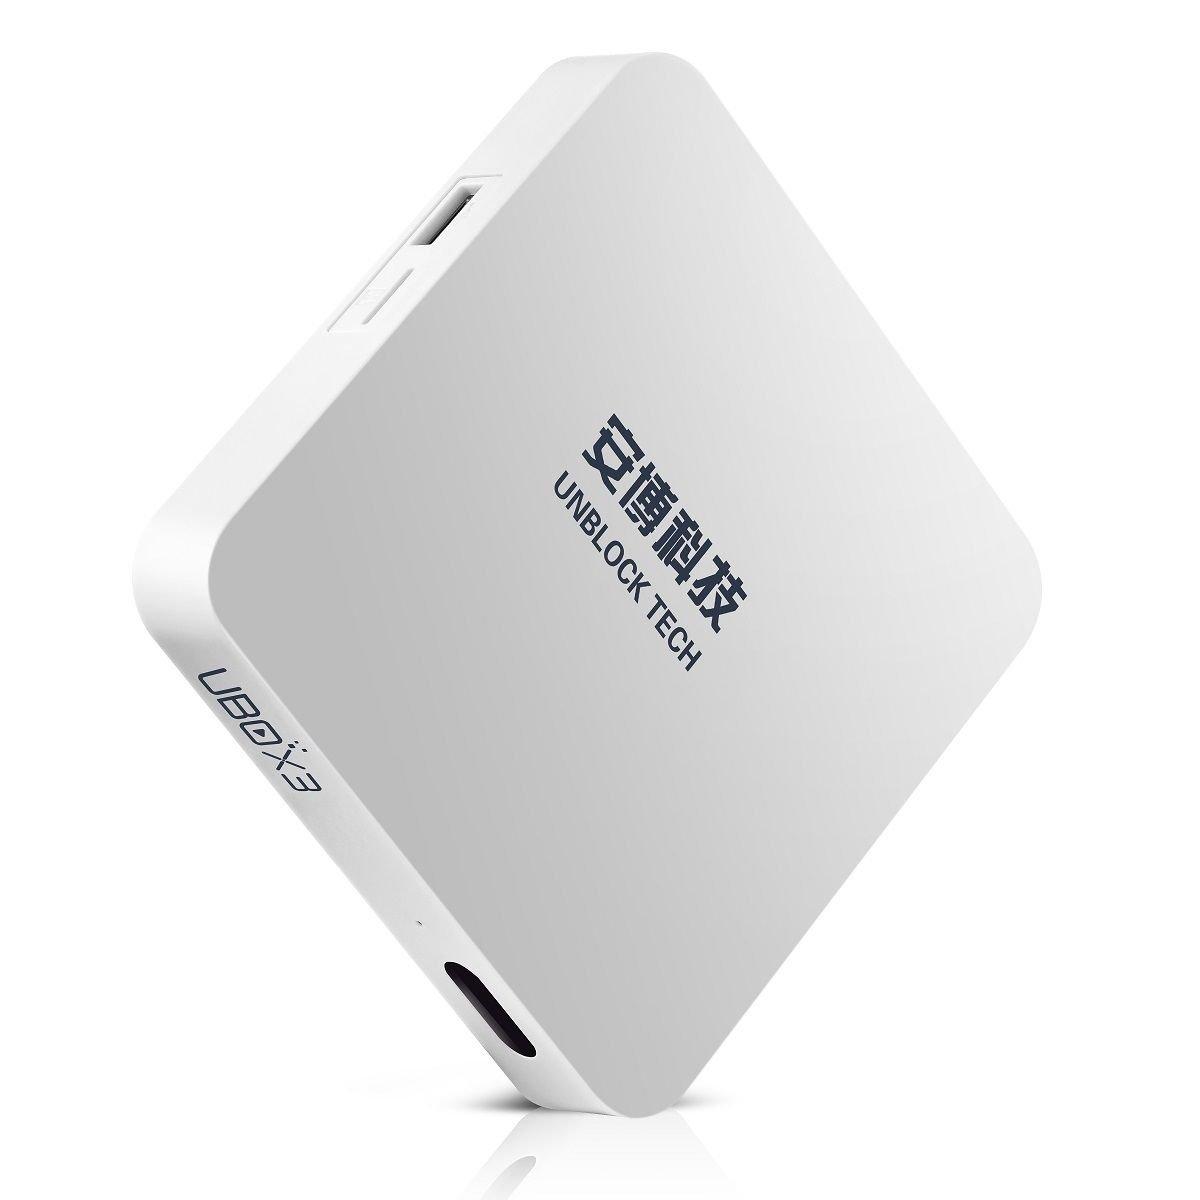 UBOX3 Unblock Tech TV Box Gen3 IPTV 安博盒子 UBOX S900 Pro 16G Fun中港臺網絡電視機頂盒